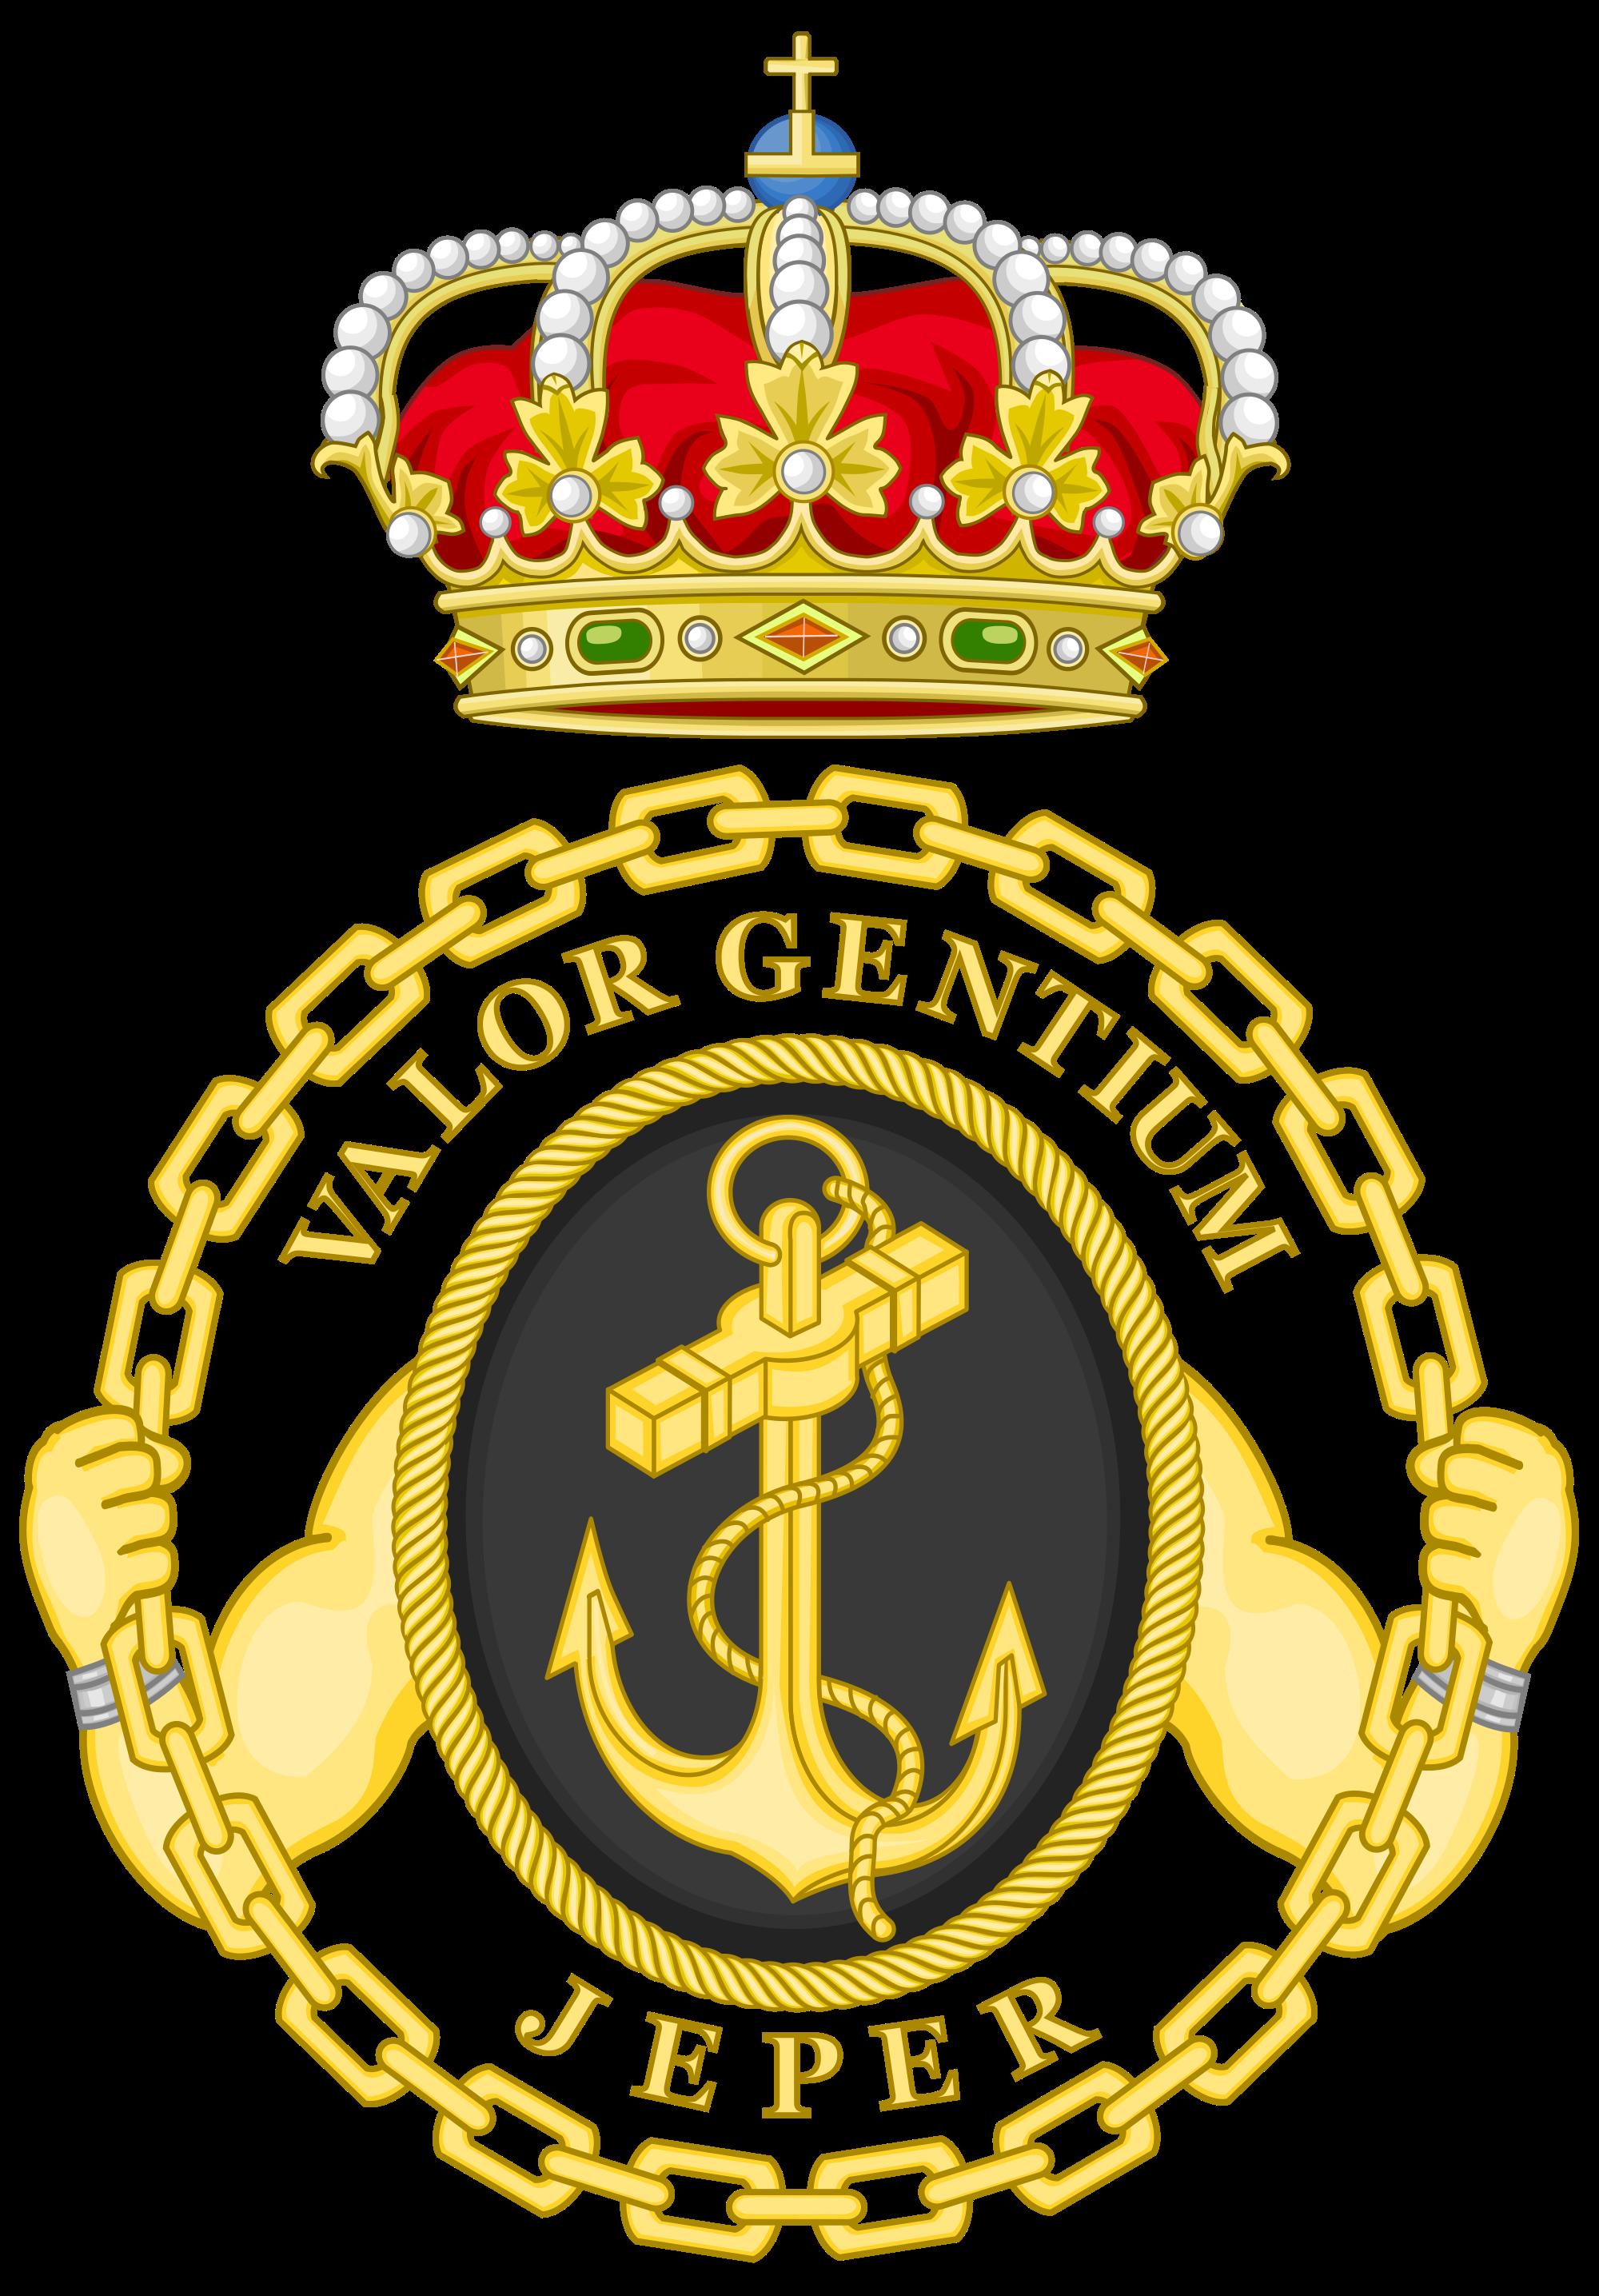 Spanish Navy Personnel Head Office Spanish, Vehicle